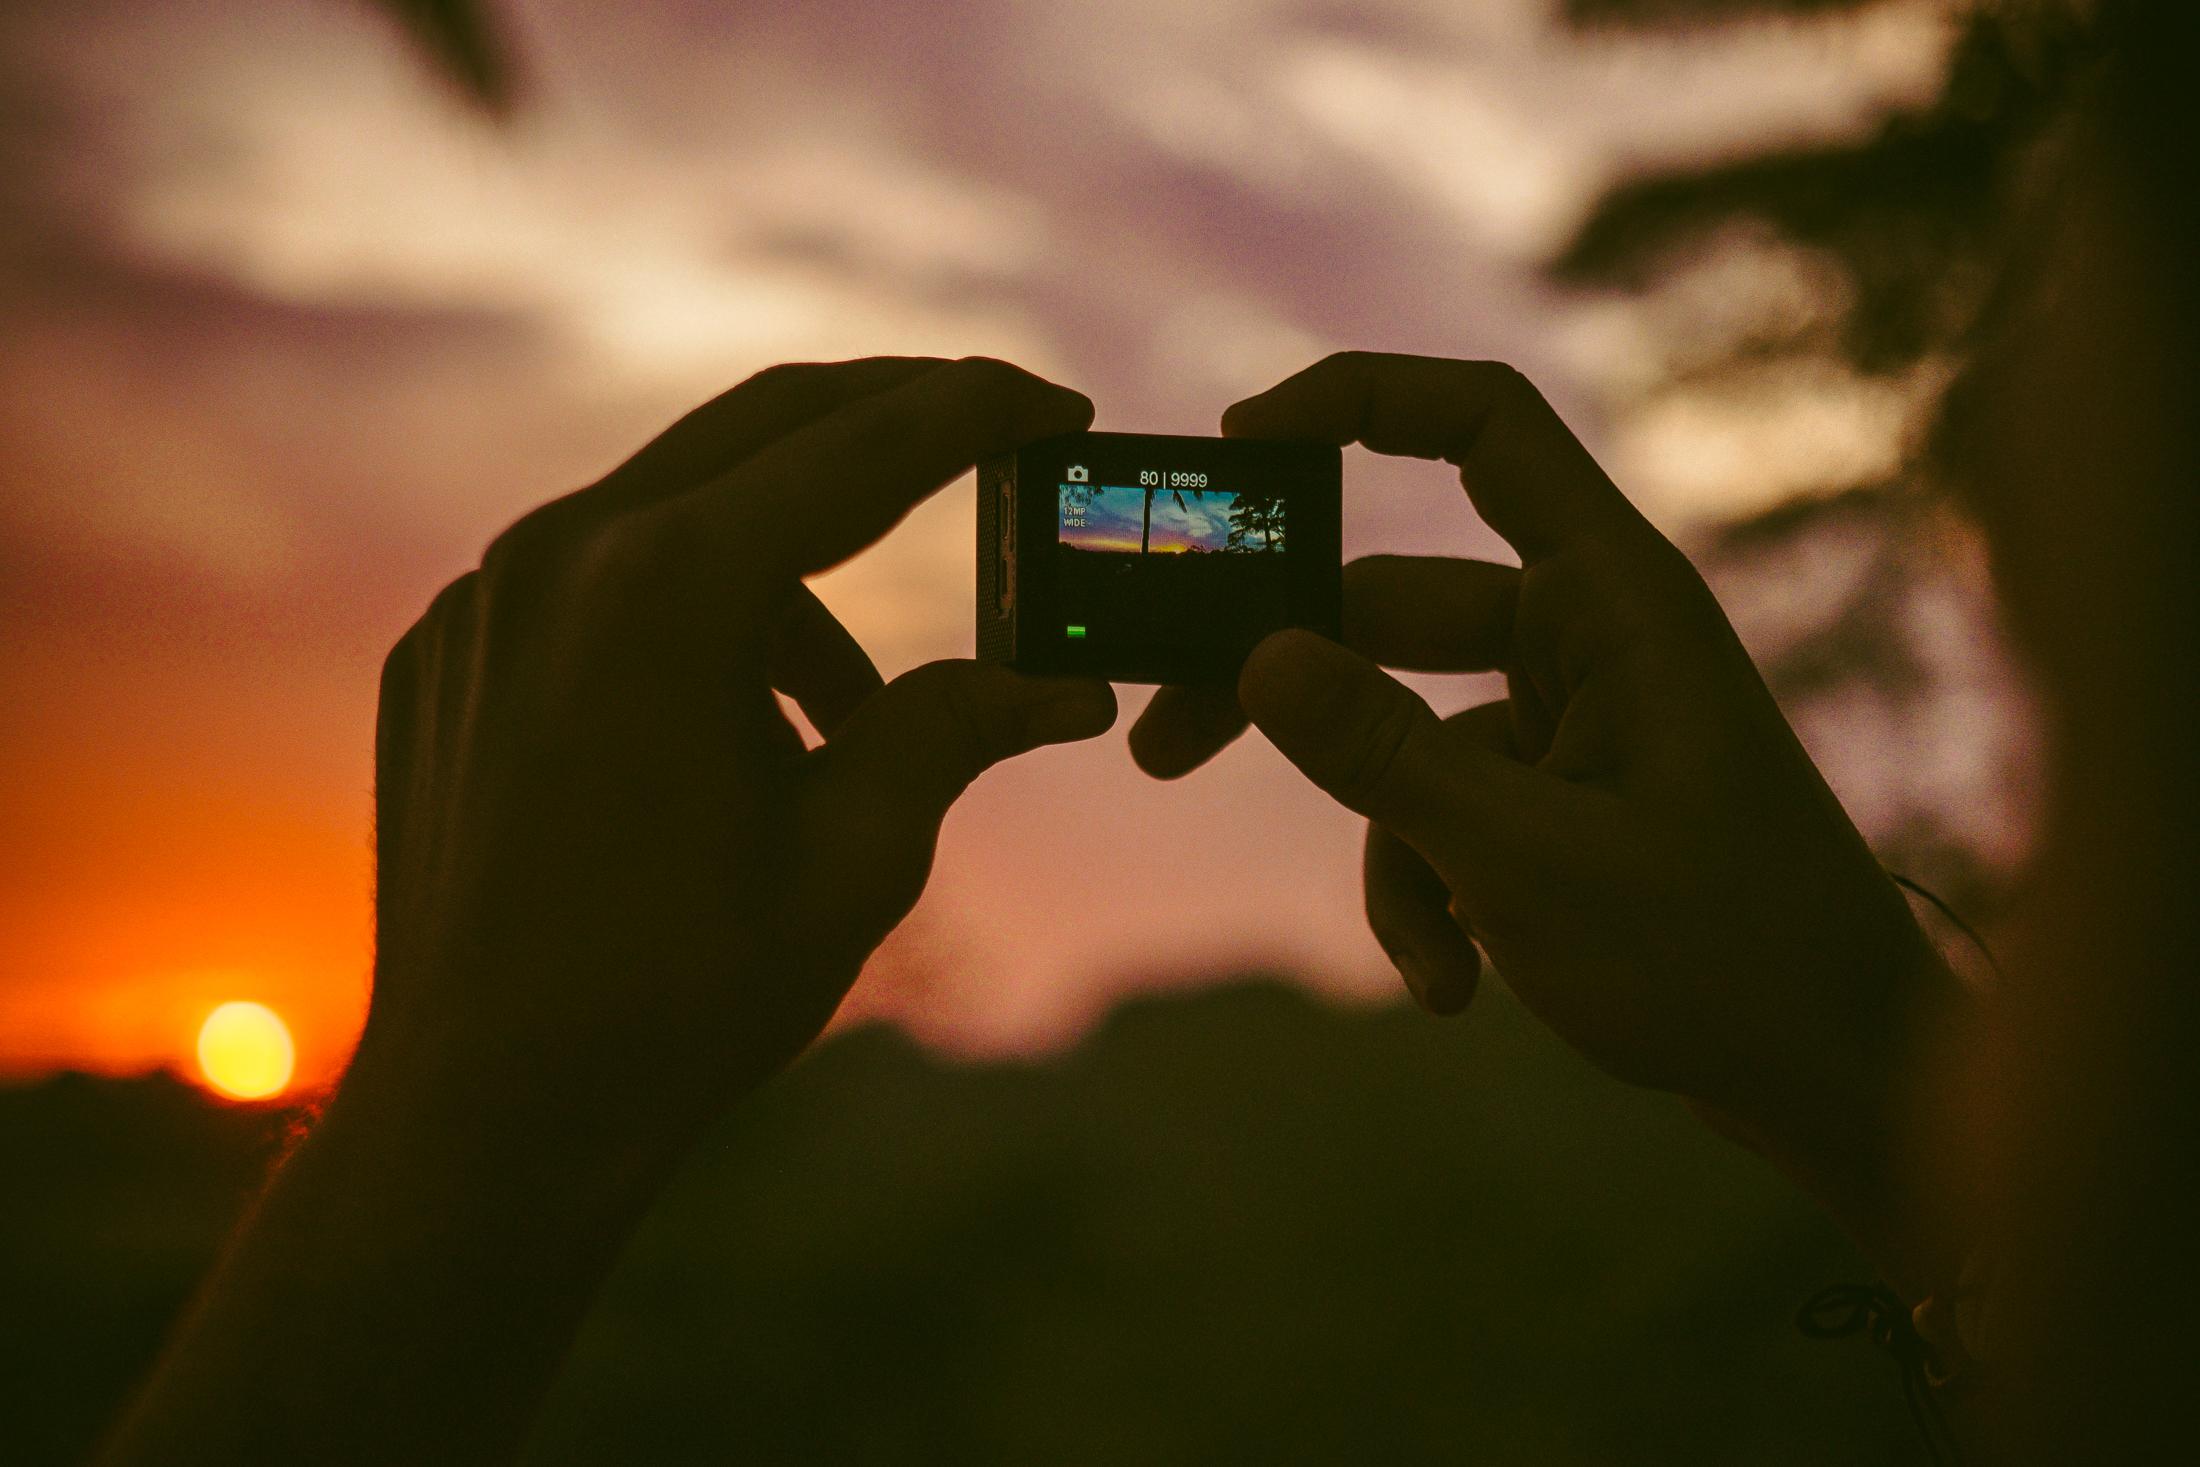 Nuno captures the sunset